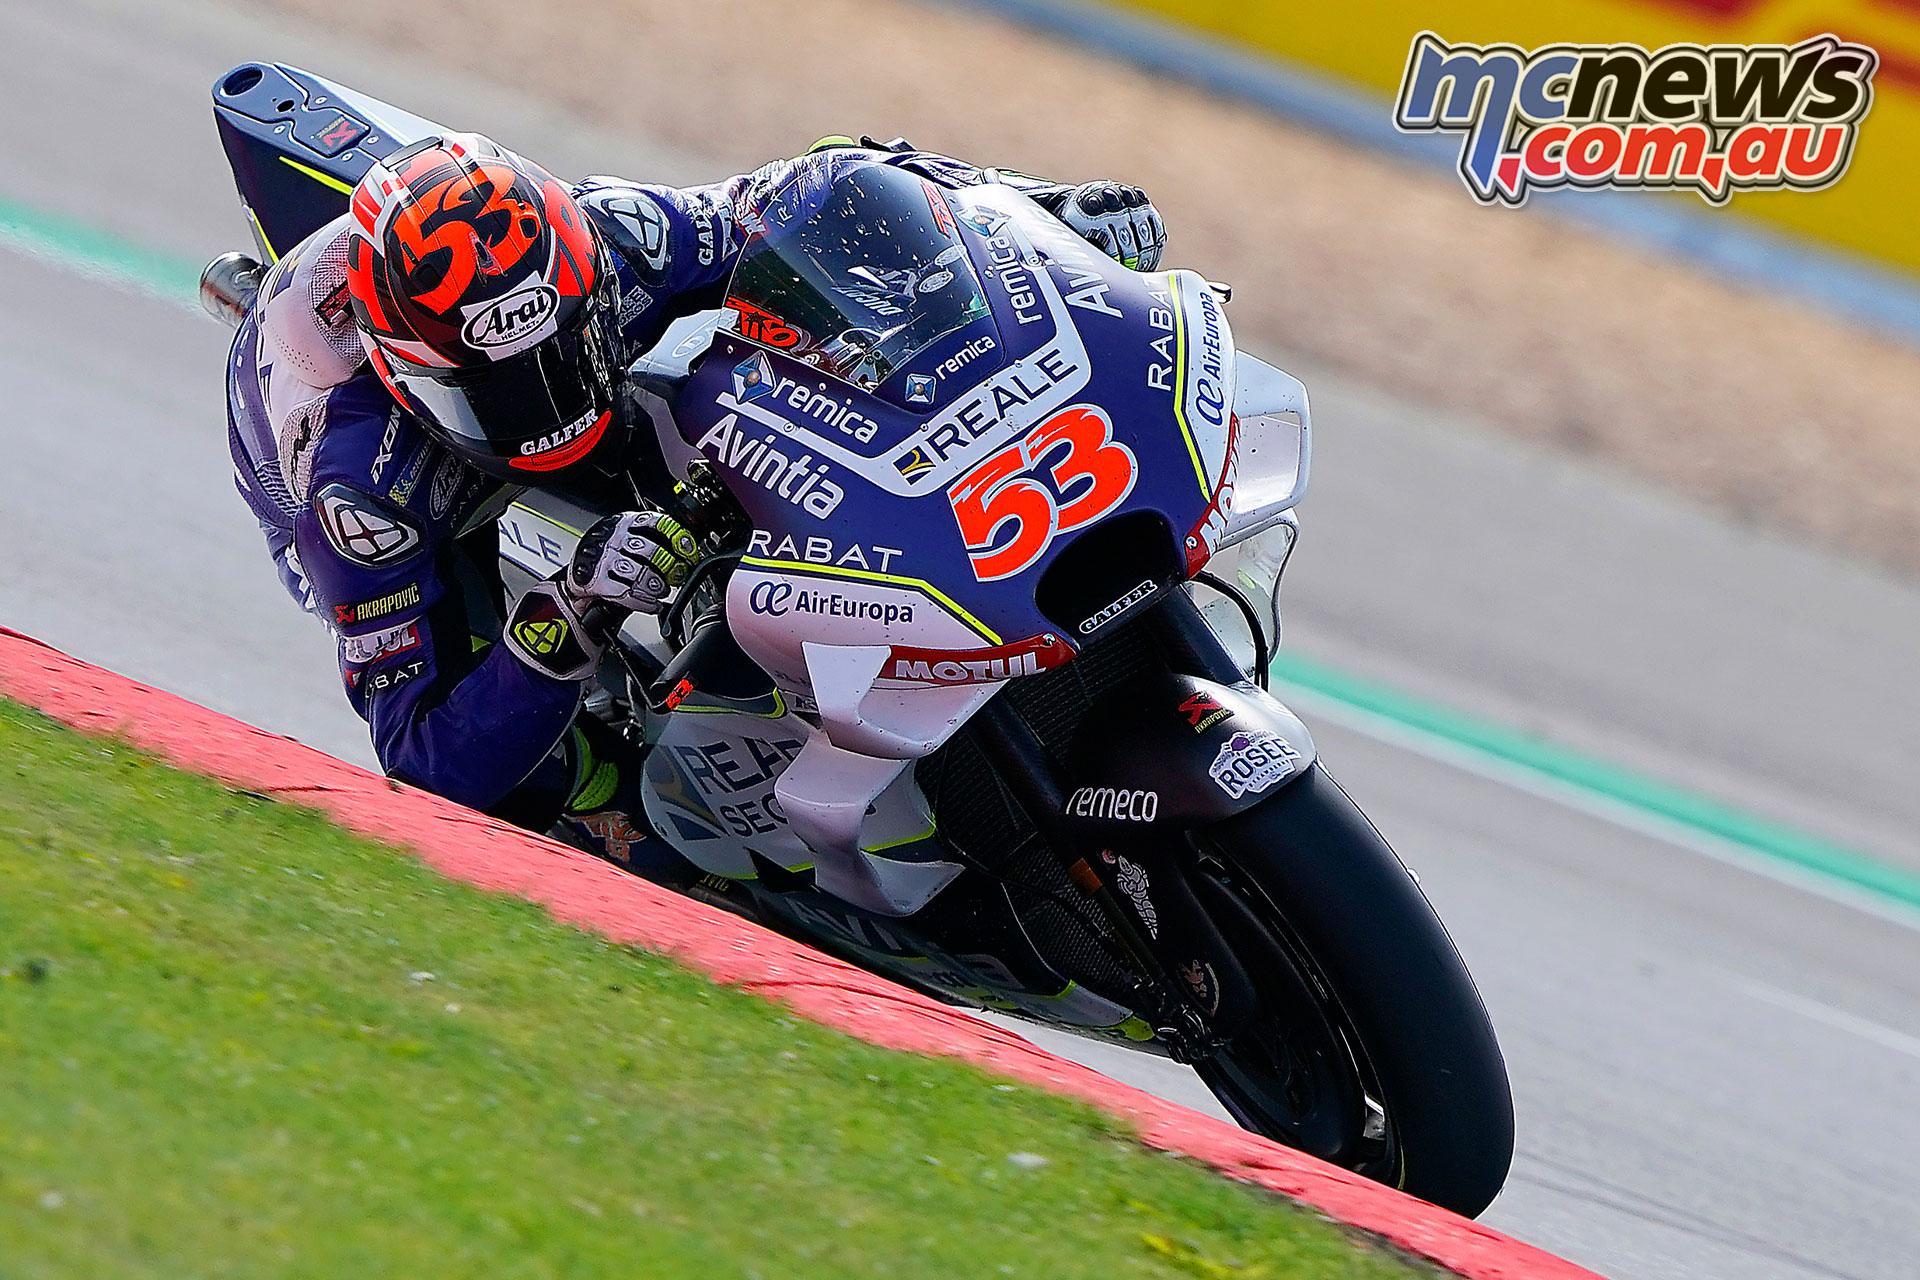 MotoGP Rnd Silverstone Tito Rabat